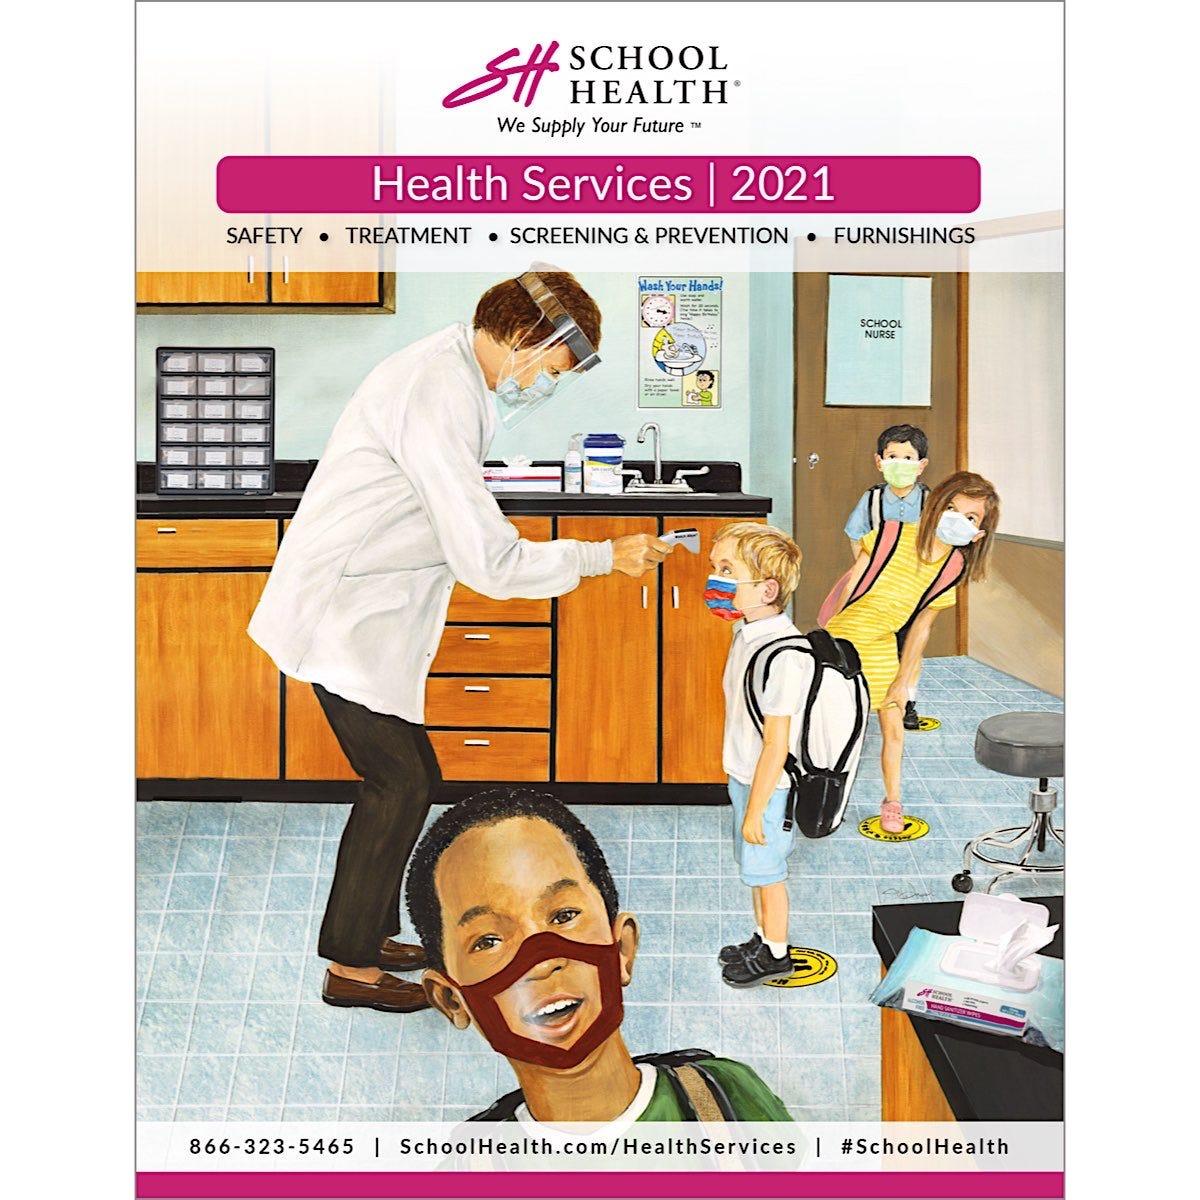 2021 Health Services Catalog